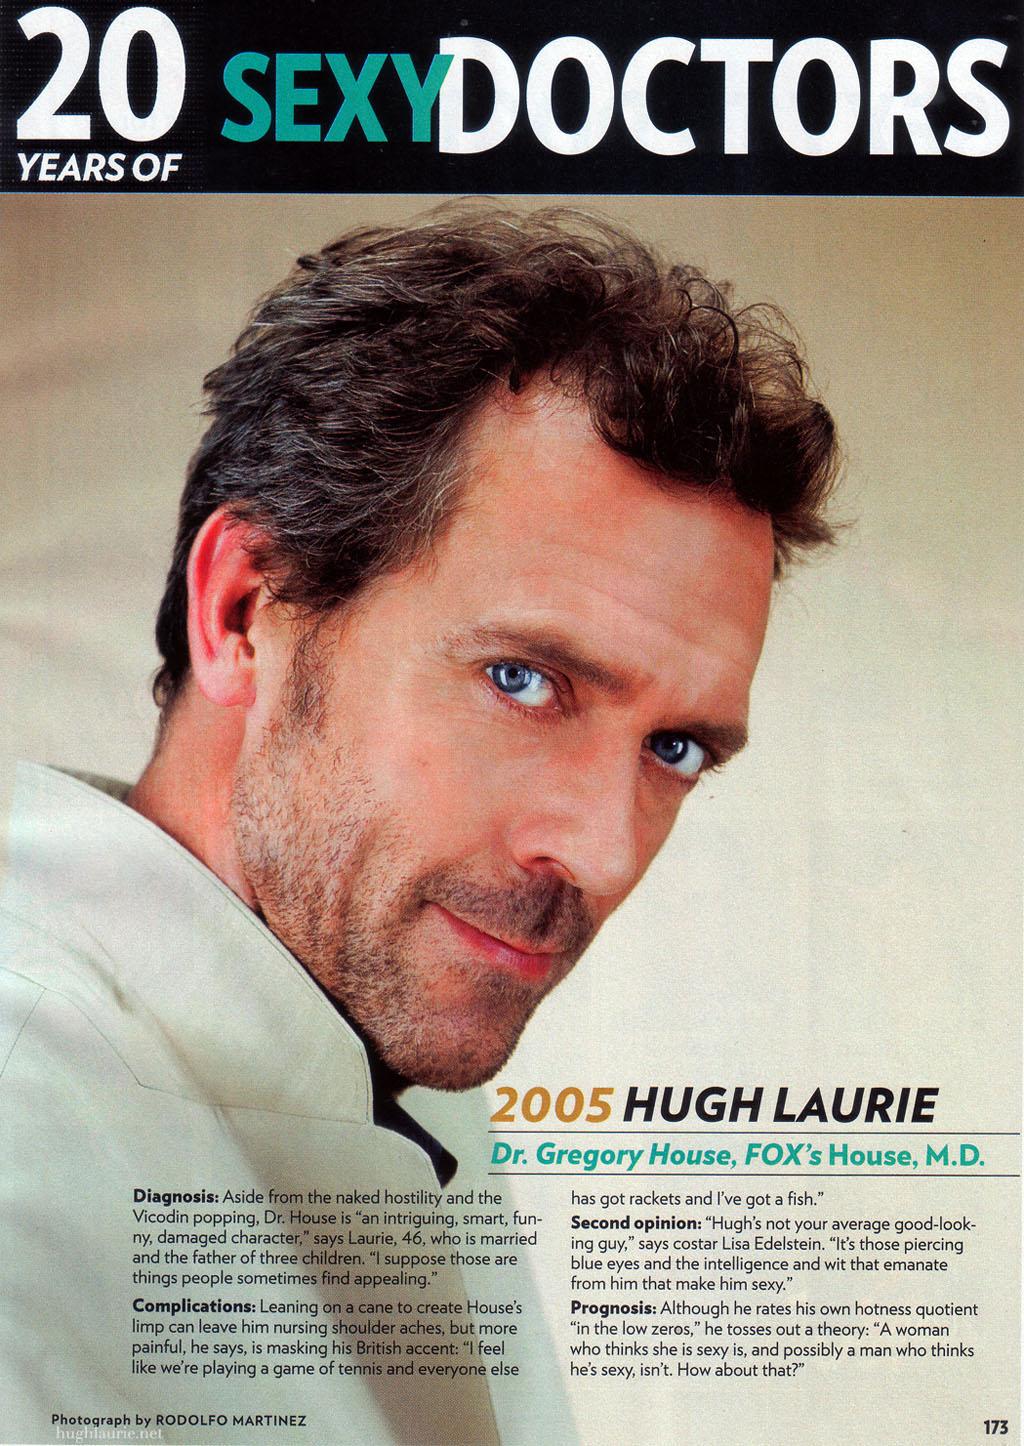 the photo of hugh laur...